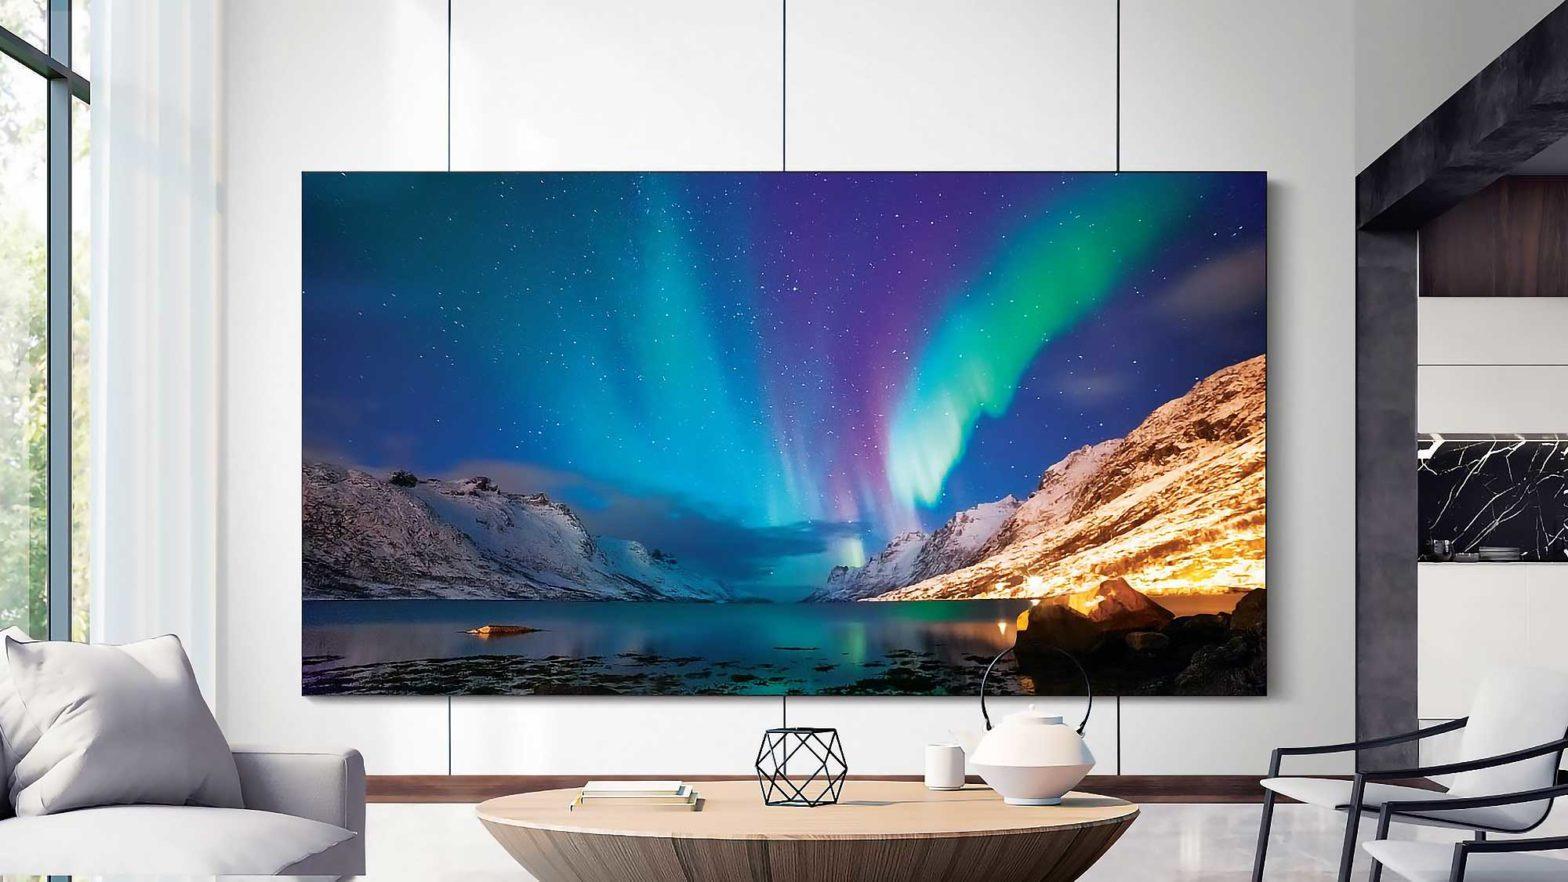 New Samsung TVs Unveiled CES 2020